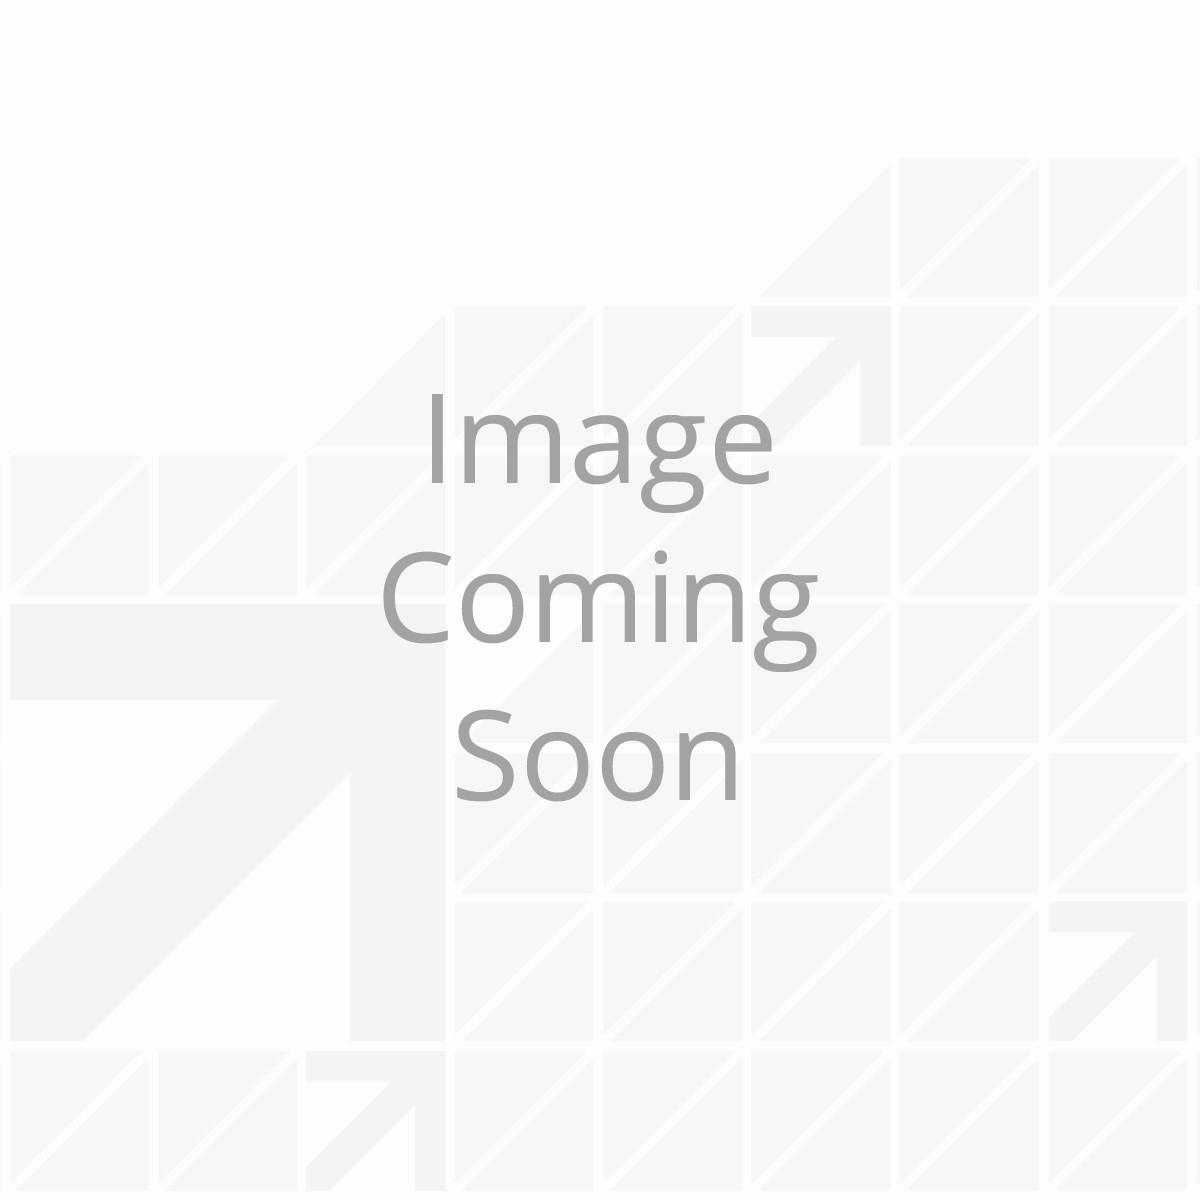 Floë Induratec 636: 12V DC Integrated Drain Down System